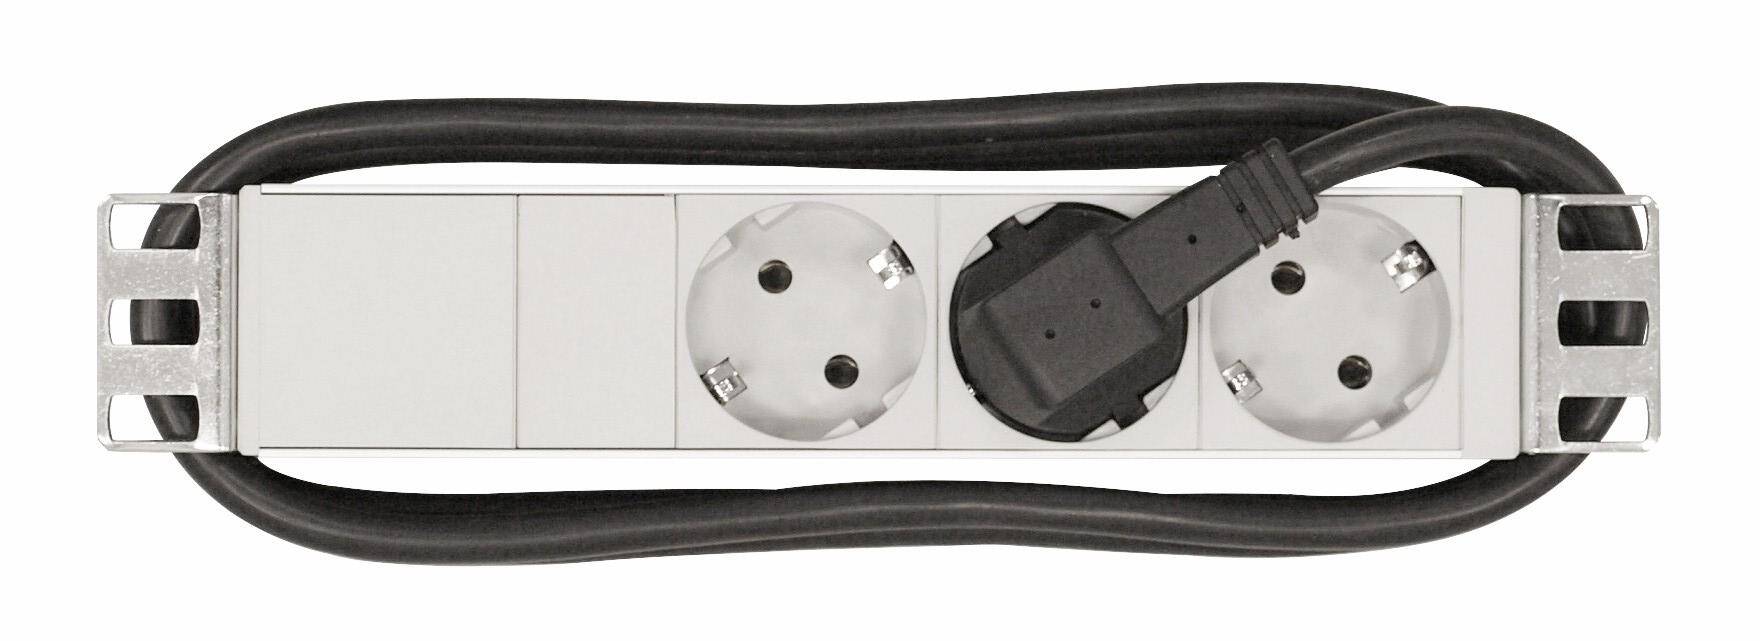 1 Stk 10 Netzleiste 3x Schuko, Profil ALU 1HE, 2m-Kabel, RAL7035 IU070122--